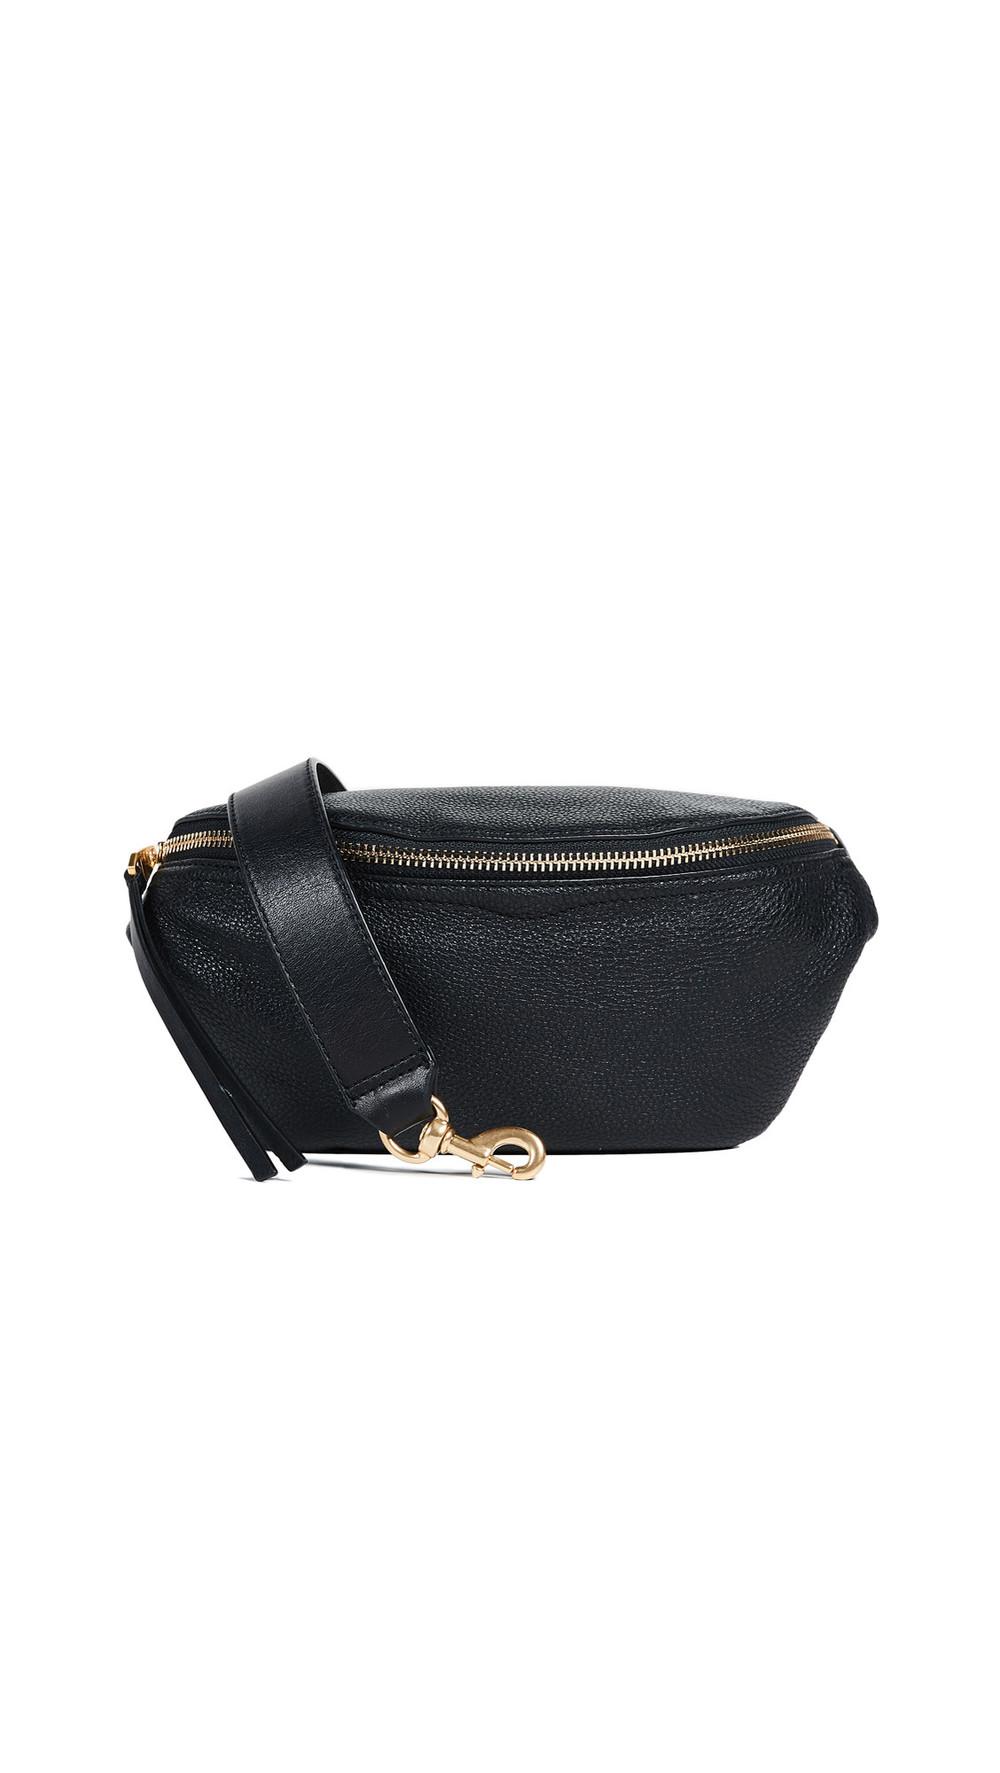 Rebecca Minkoff Bree Belt Bag in black